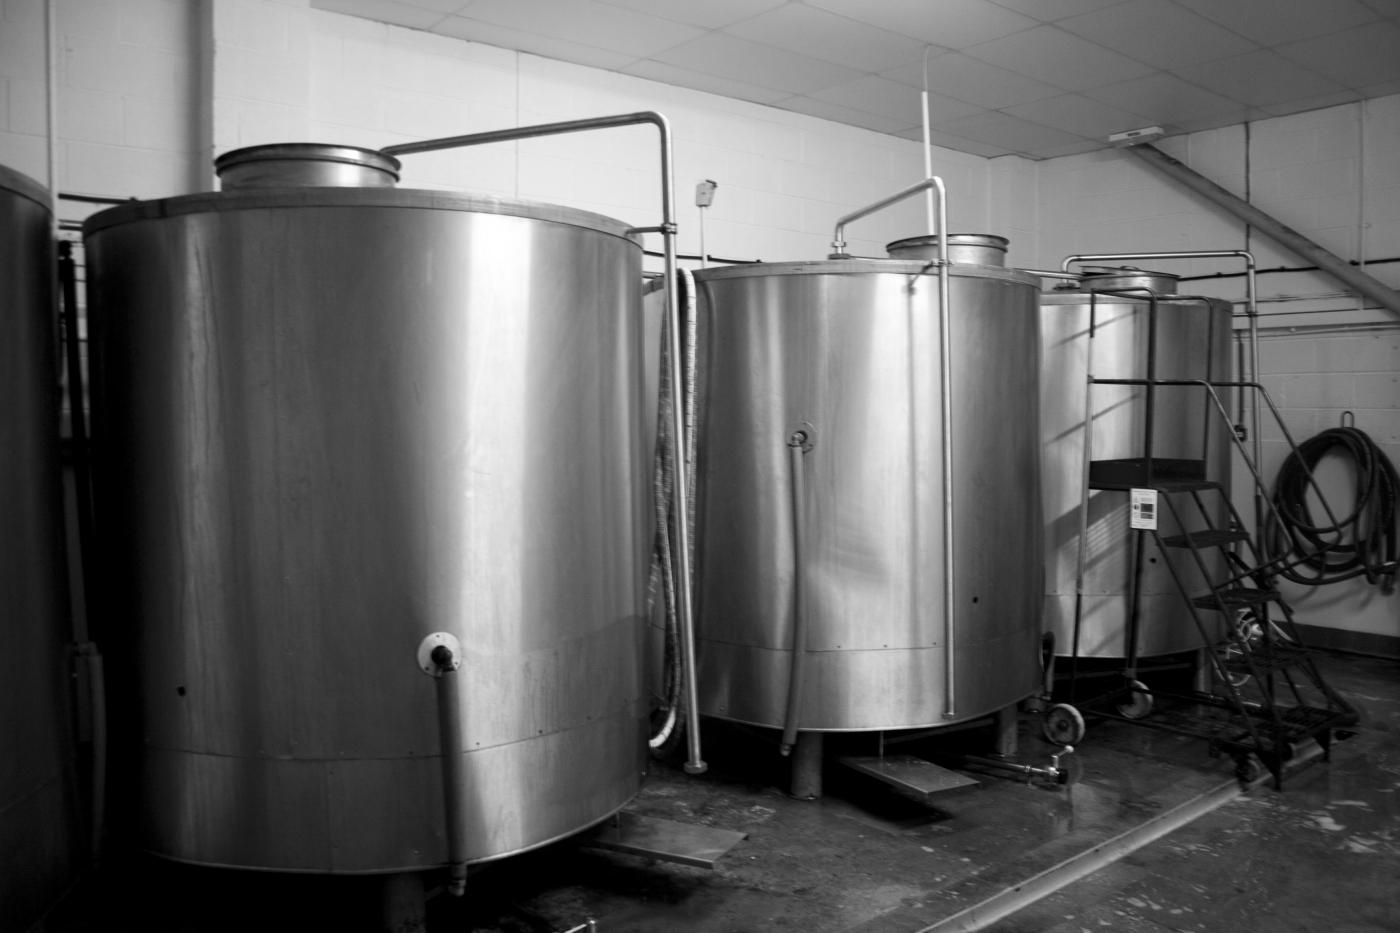 Leeds Brewery fermenting tanks